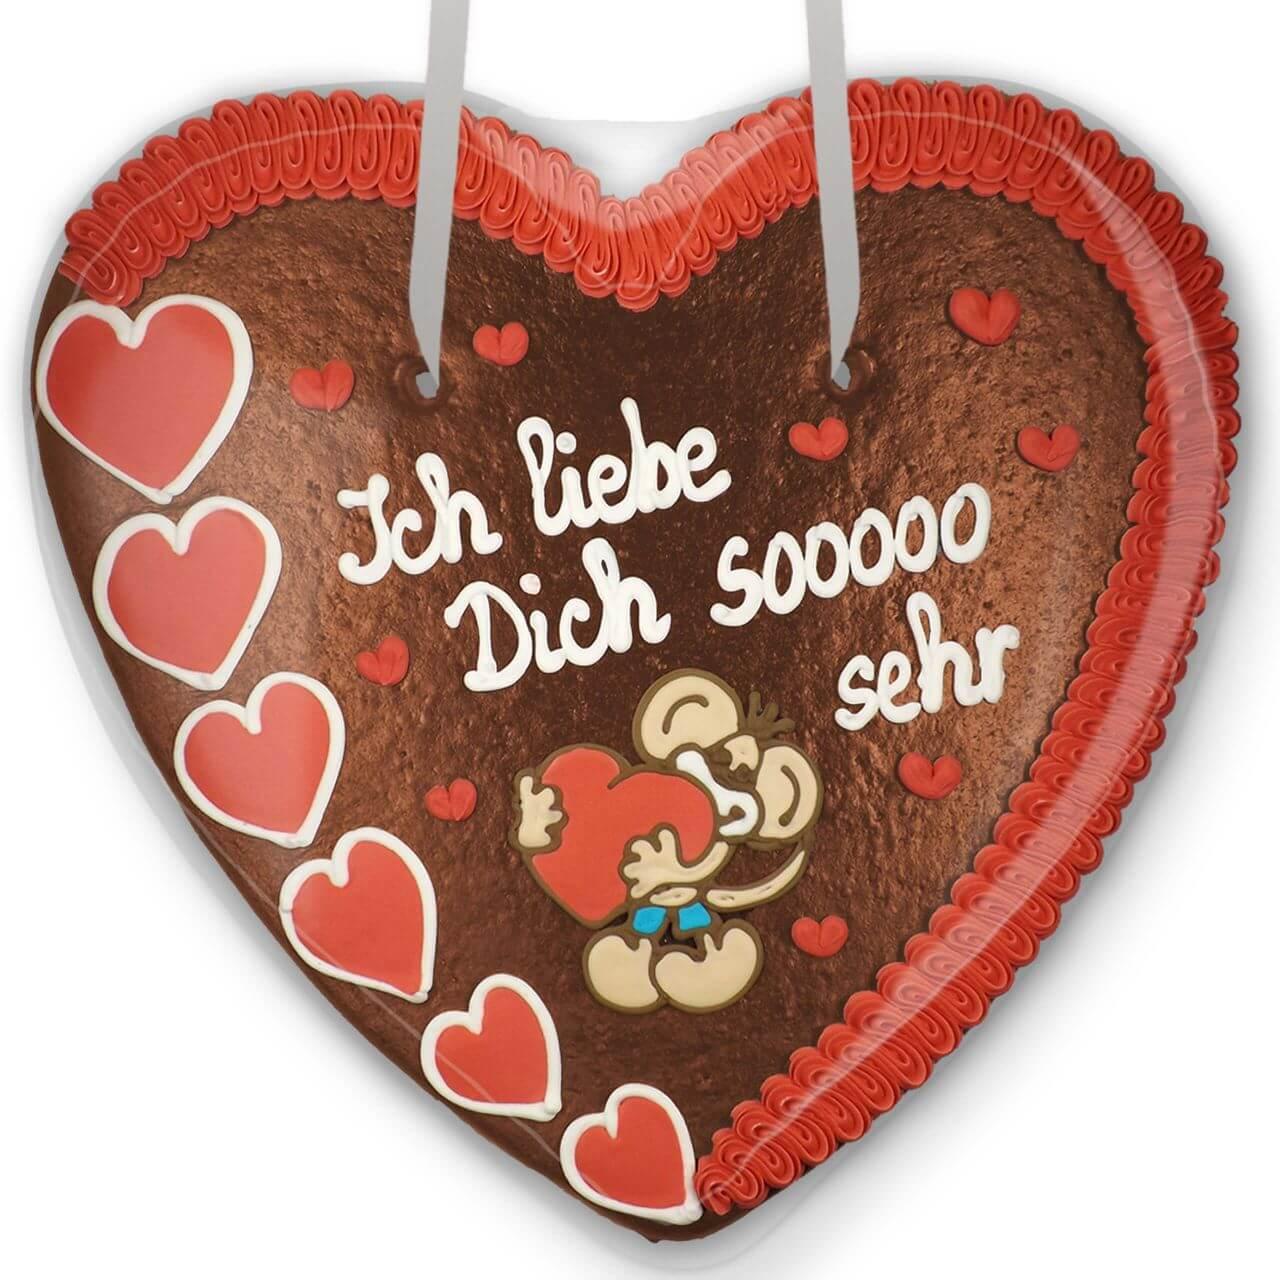 Xxl Gingerbread Heart Ich Liebe Dich So Sehr Lebkuchen Markt De